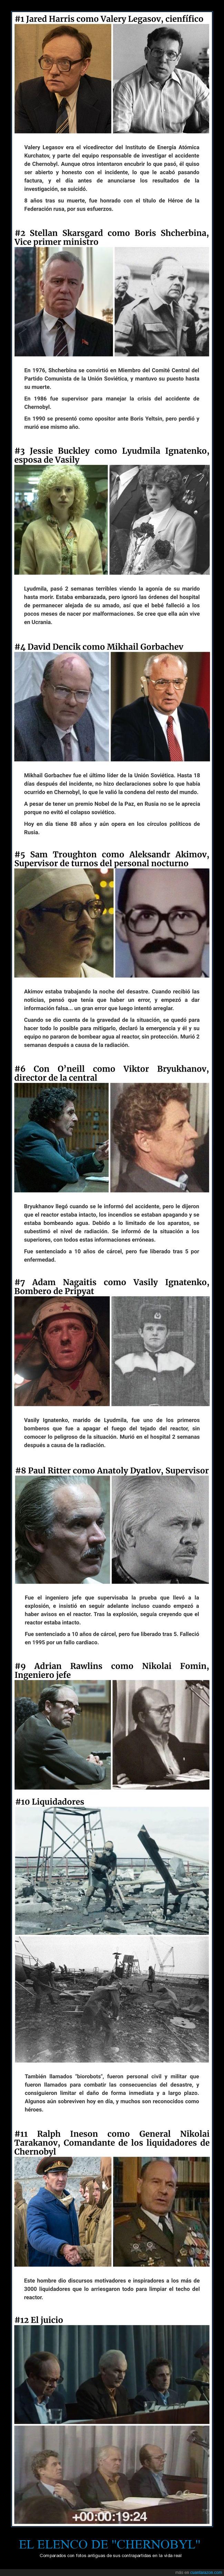 chernobyl,personajes,reparto